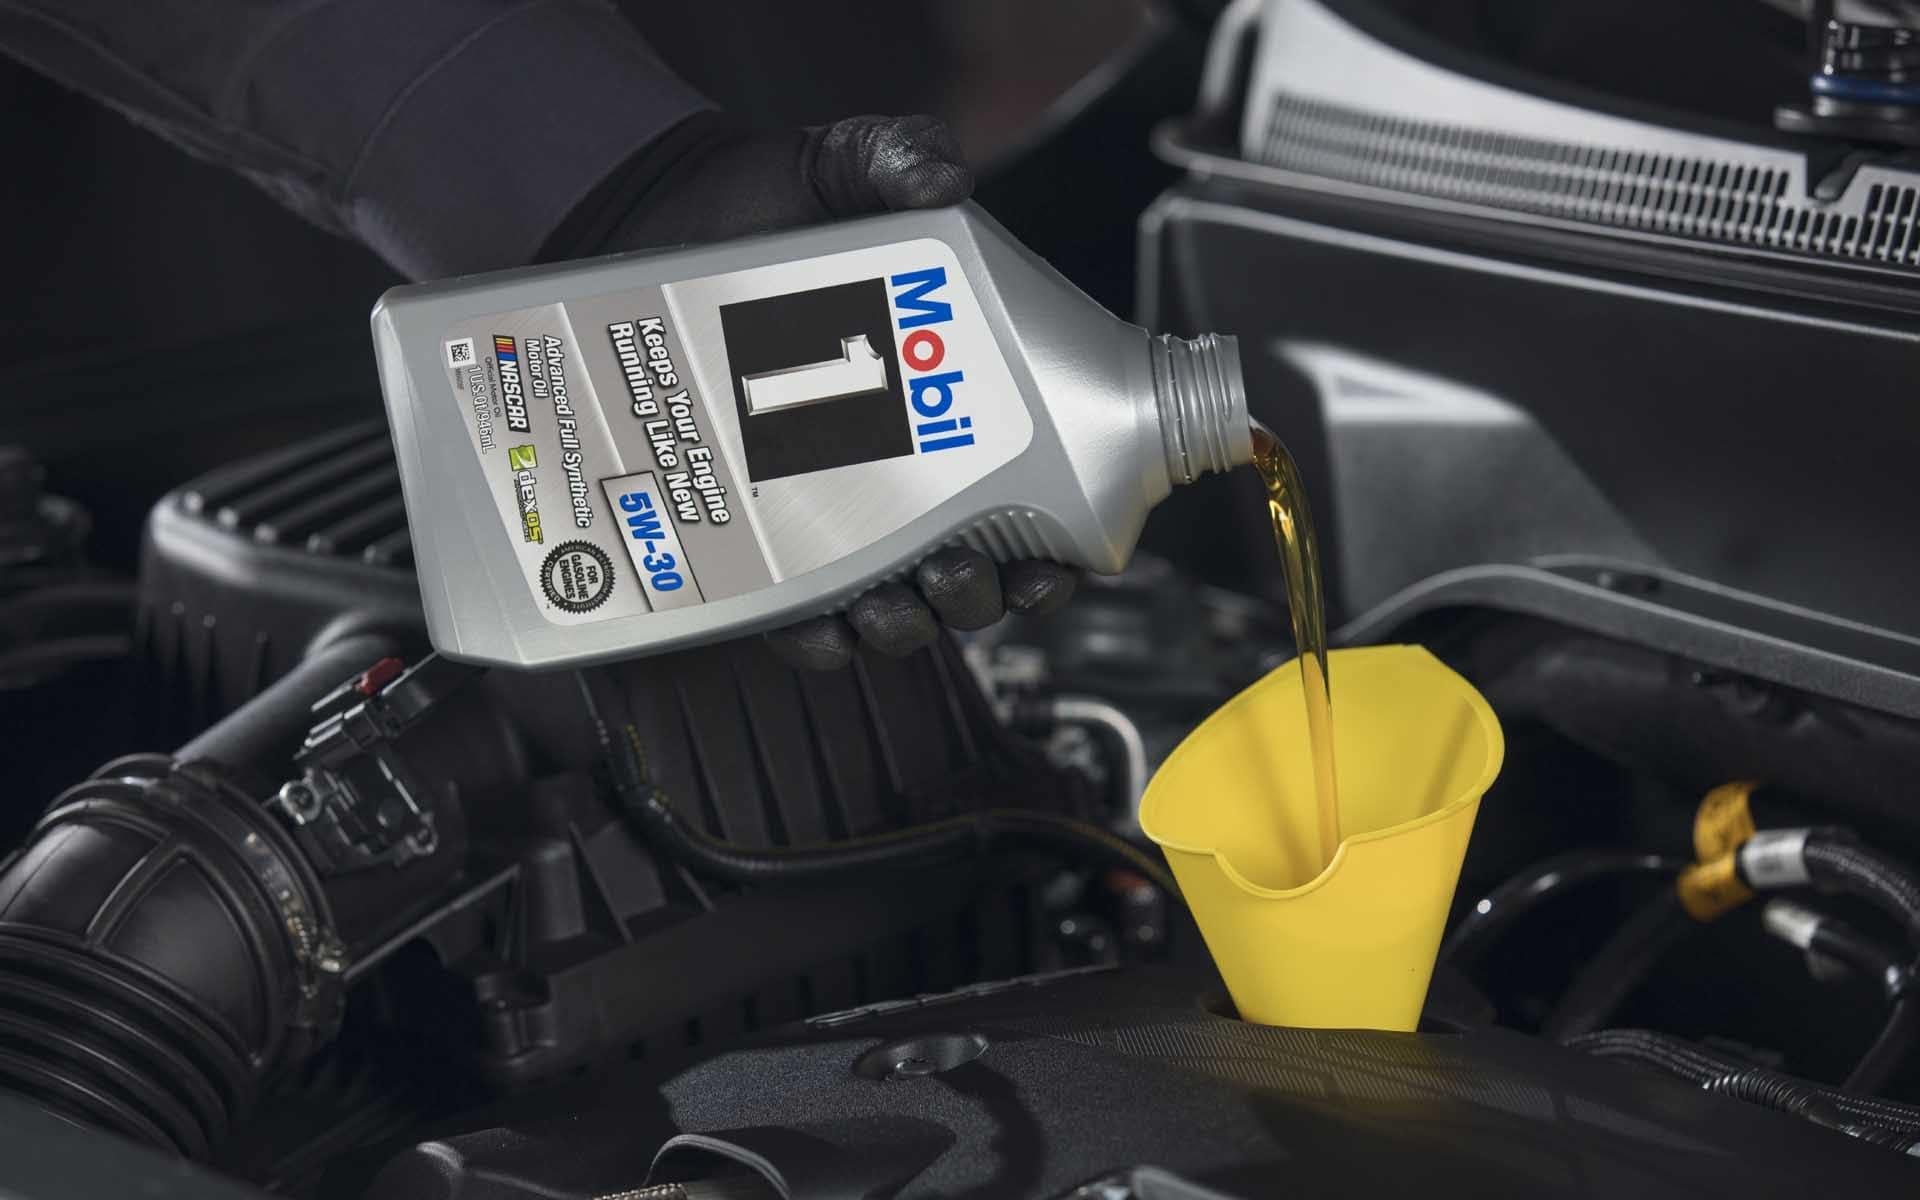 2021 Chevrolet Tahoe Oil Change